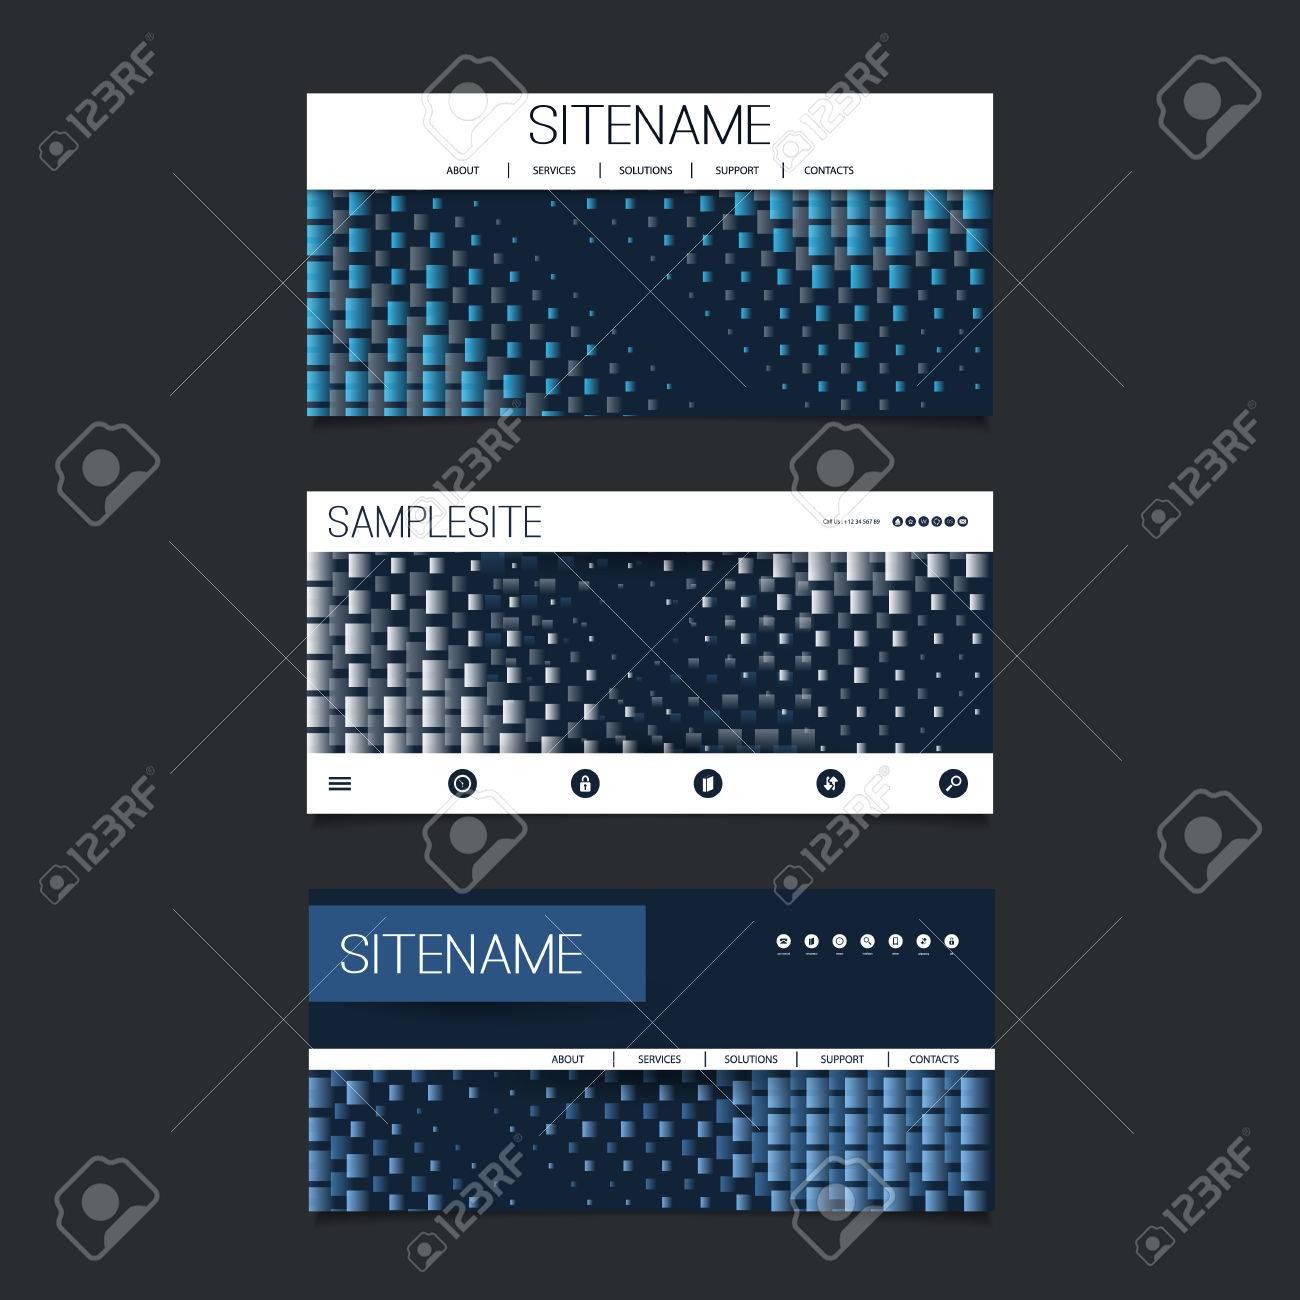 Web Design Elements - Header Design Set with Dark Blue Abstract